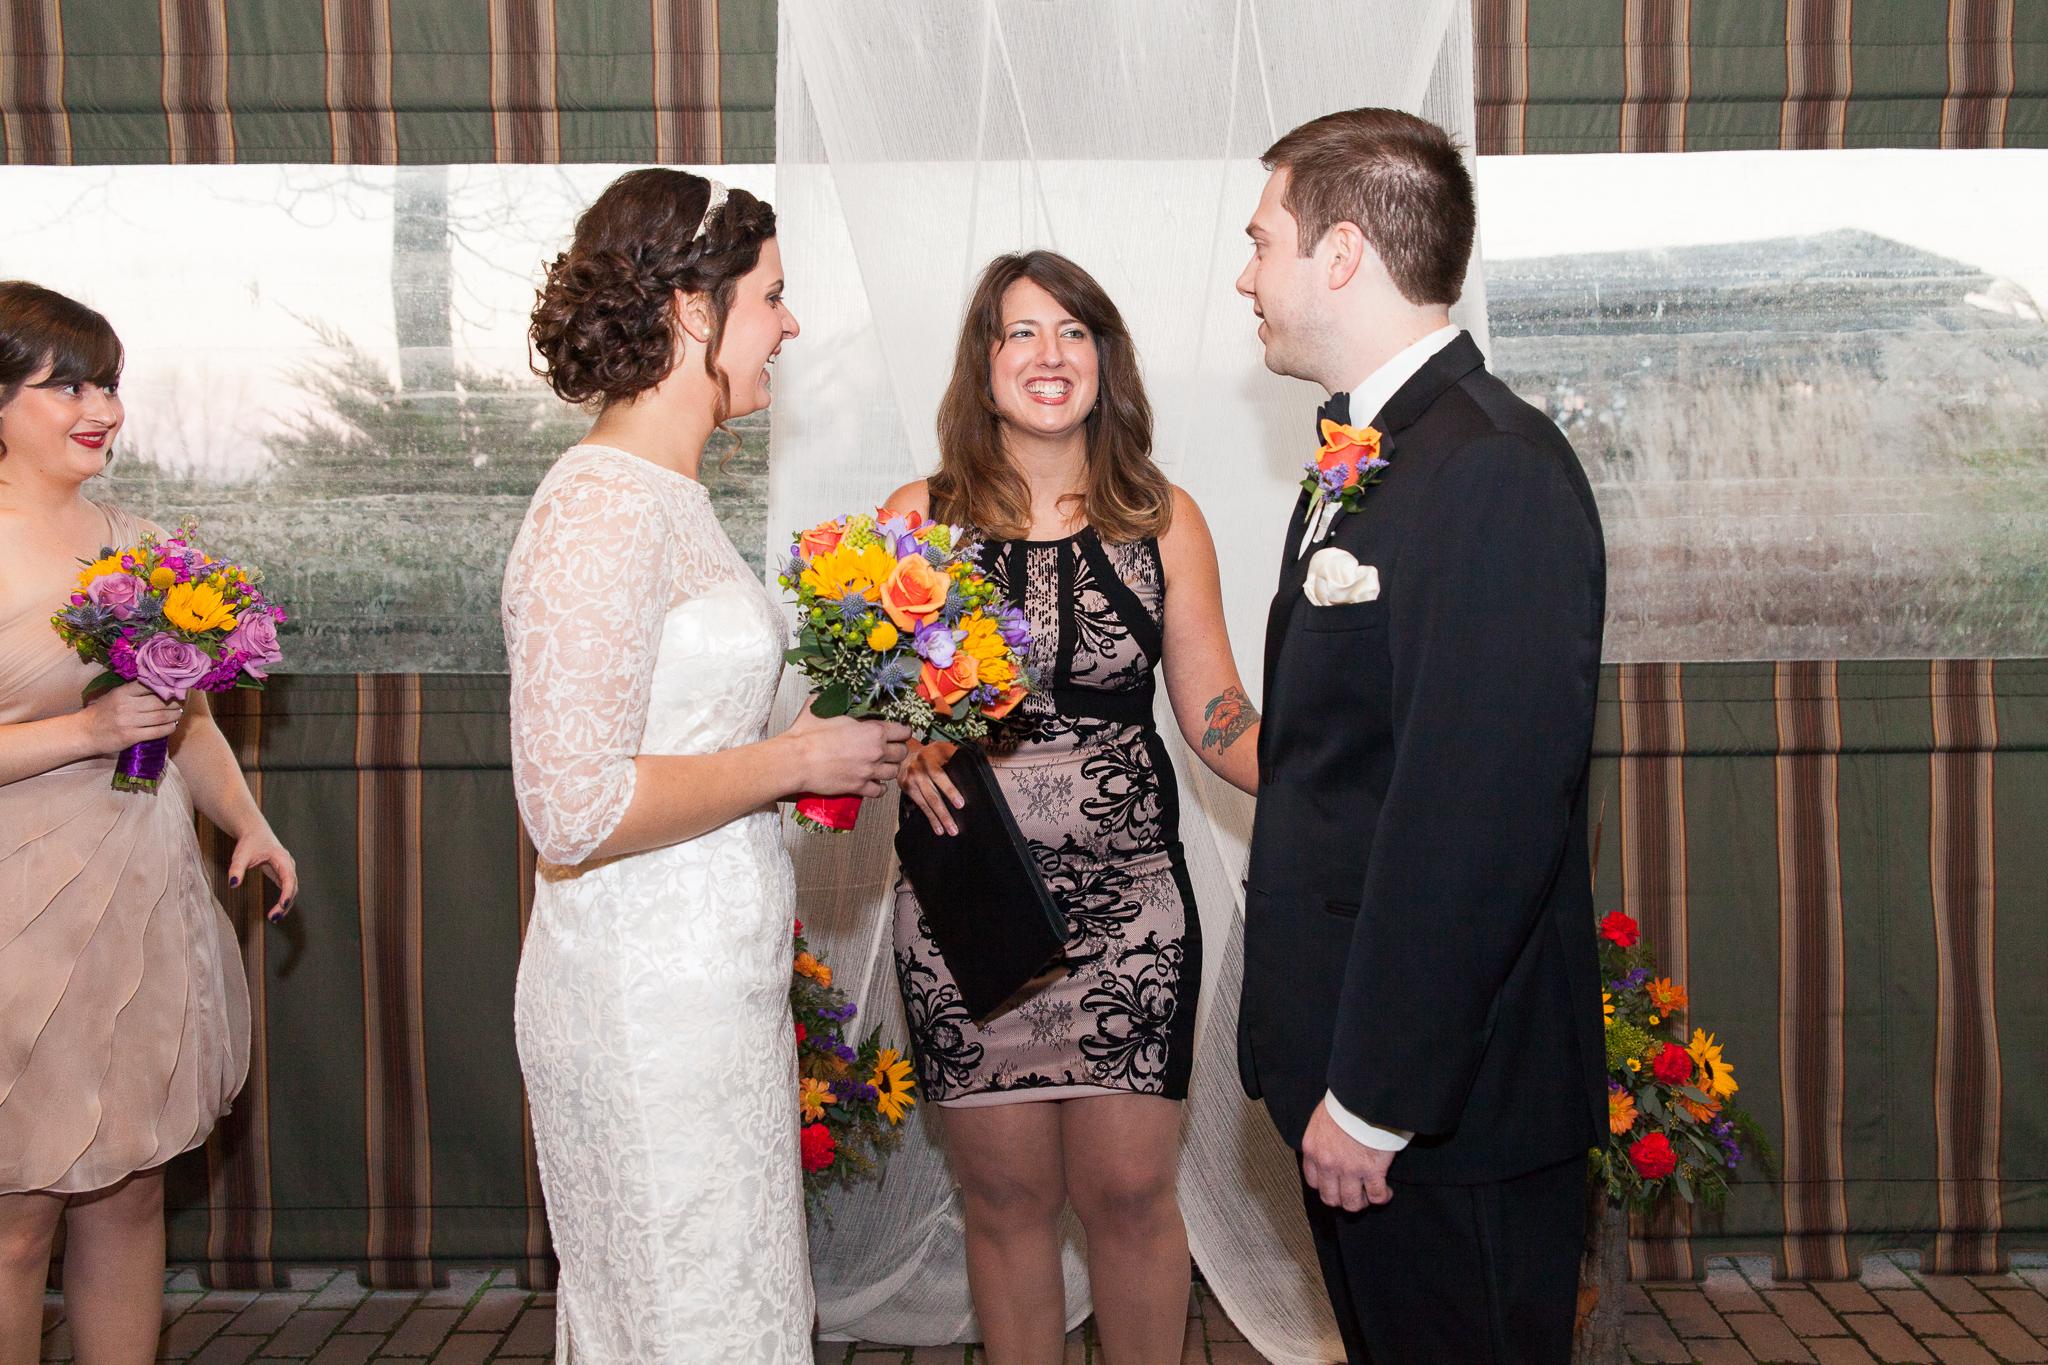 camuglia-whomstudio-chelsea_and_andy-nycphotographer-wedding-brooklyn-buffalo-timberlodge-072-0559.jpg